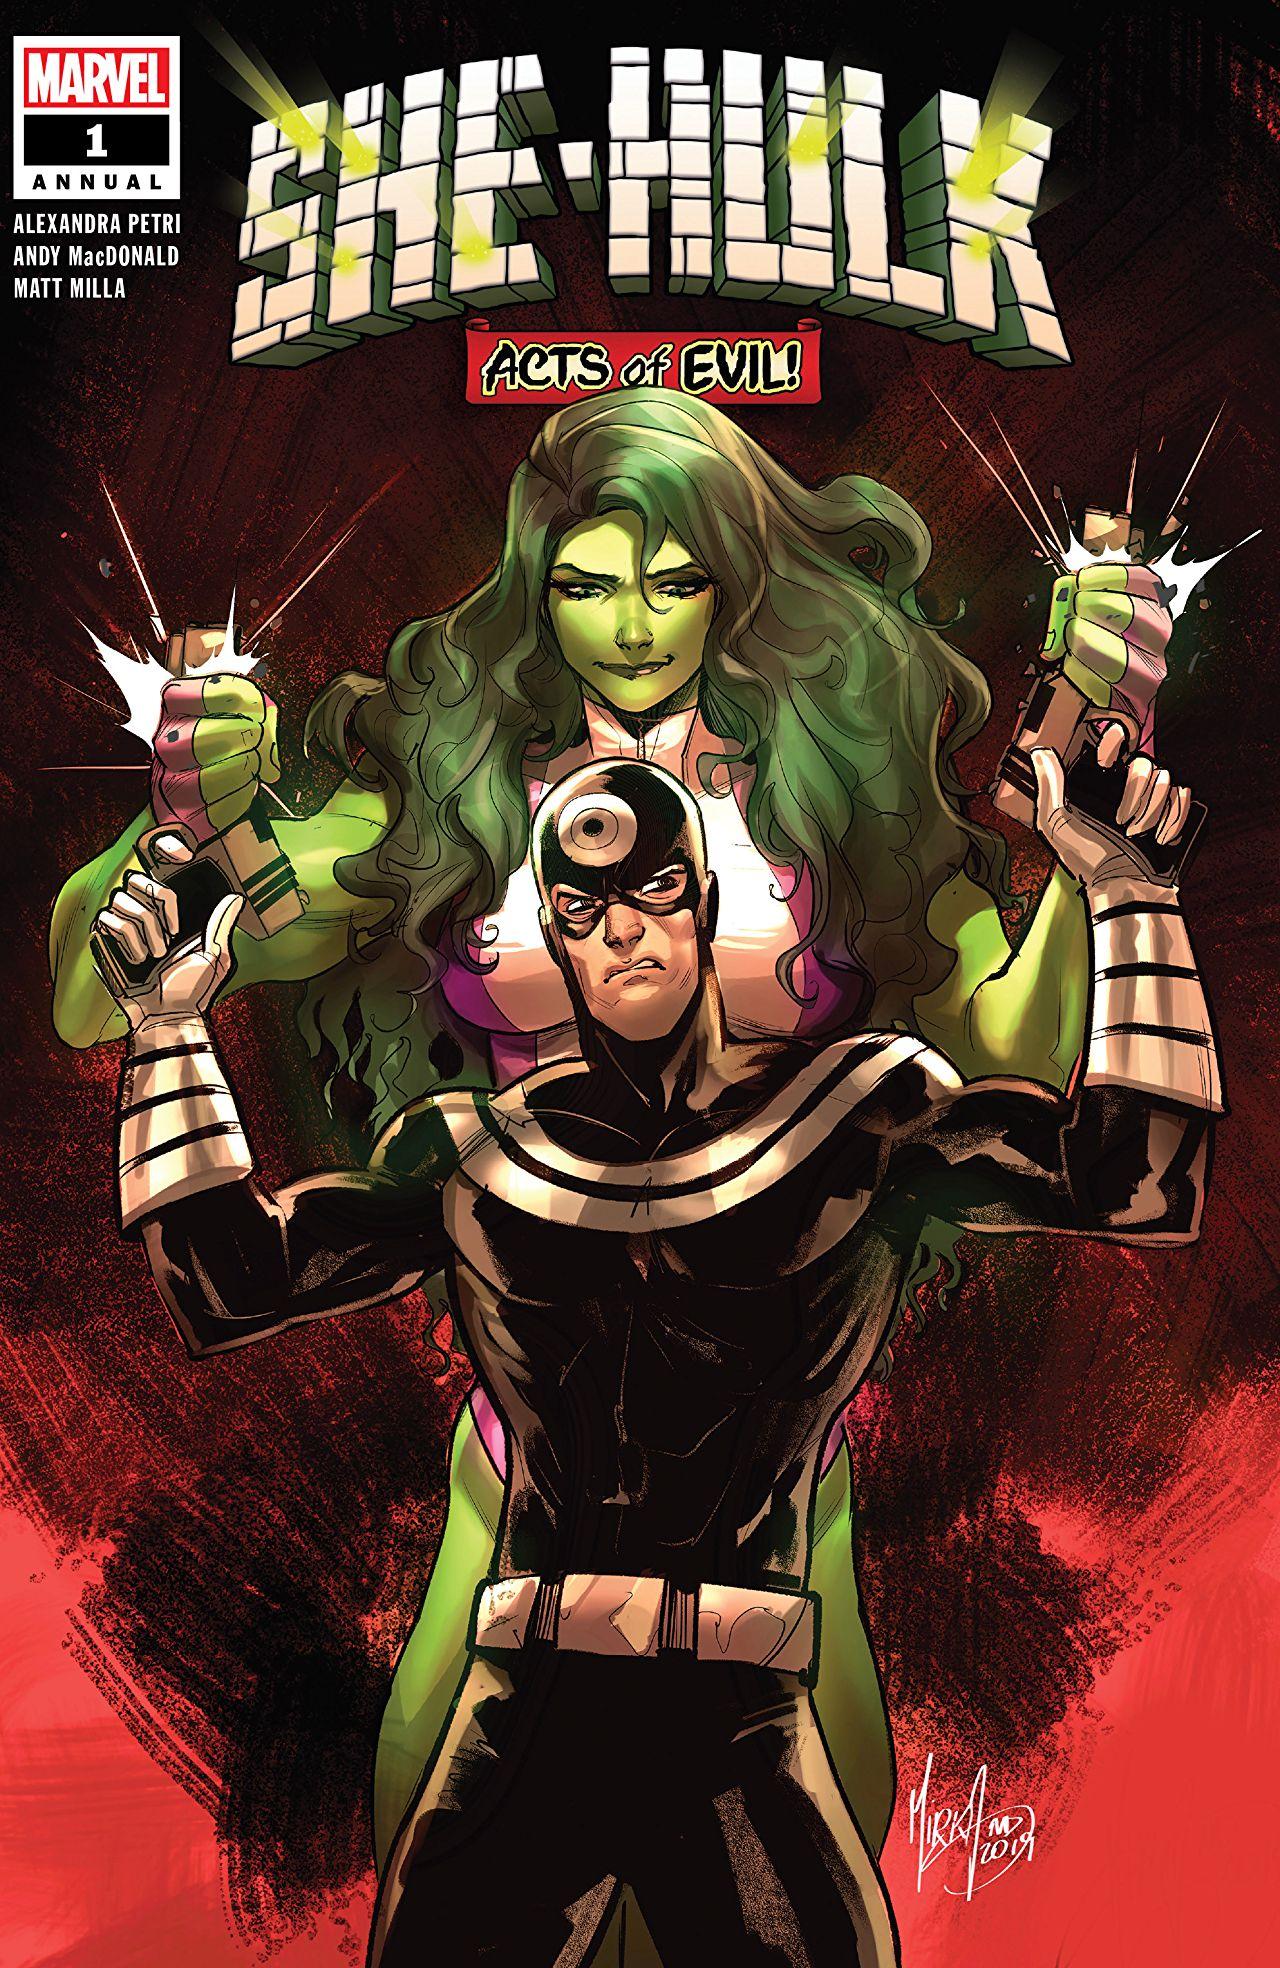 She-Hulk Annual (2019) #1 Cover